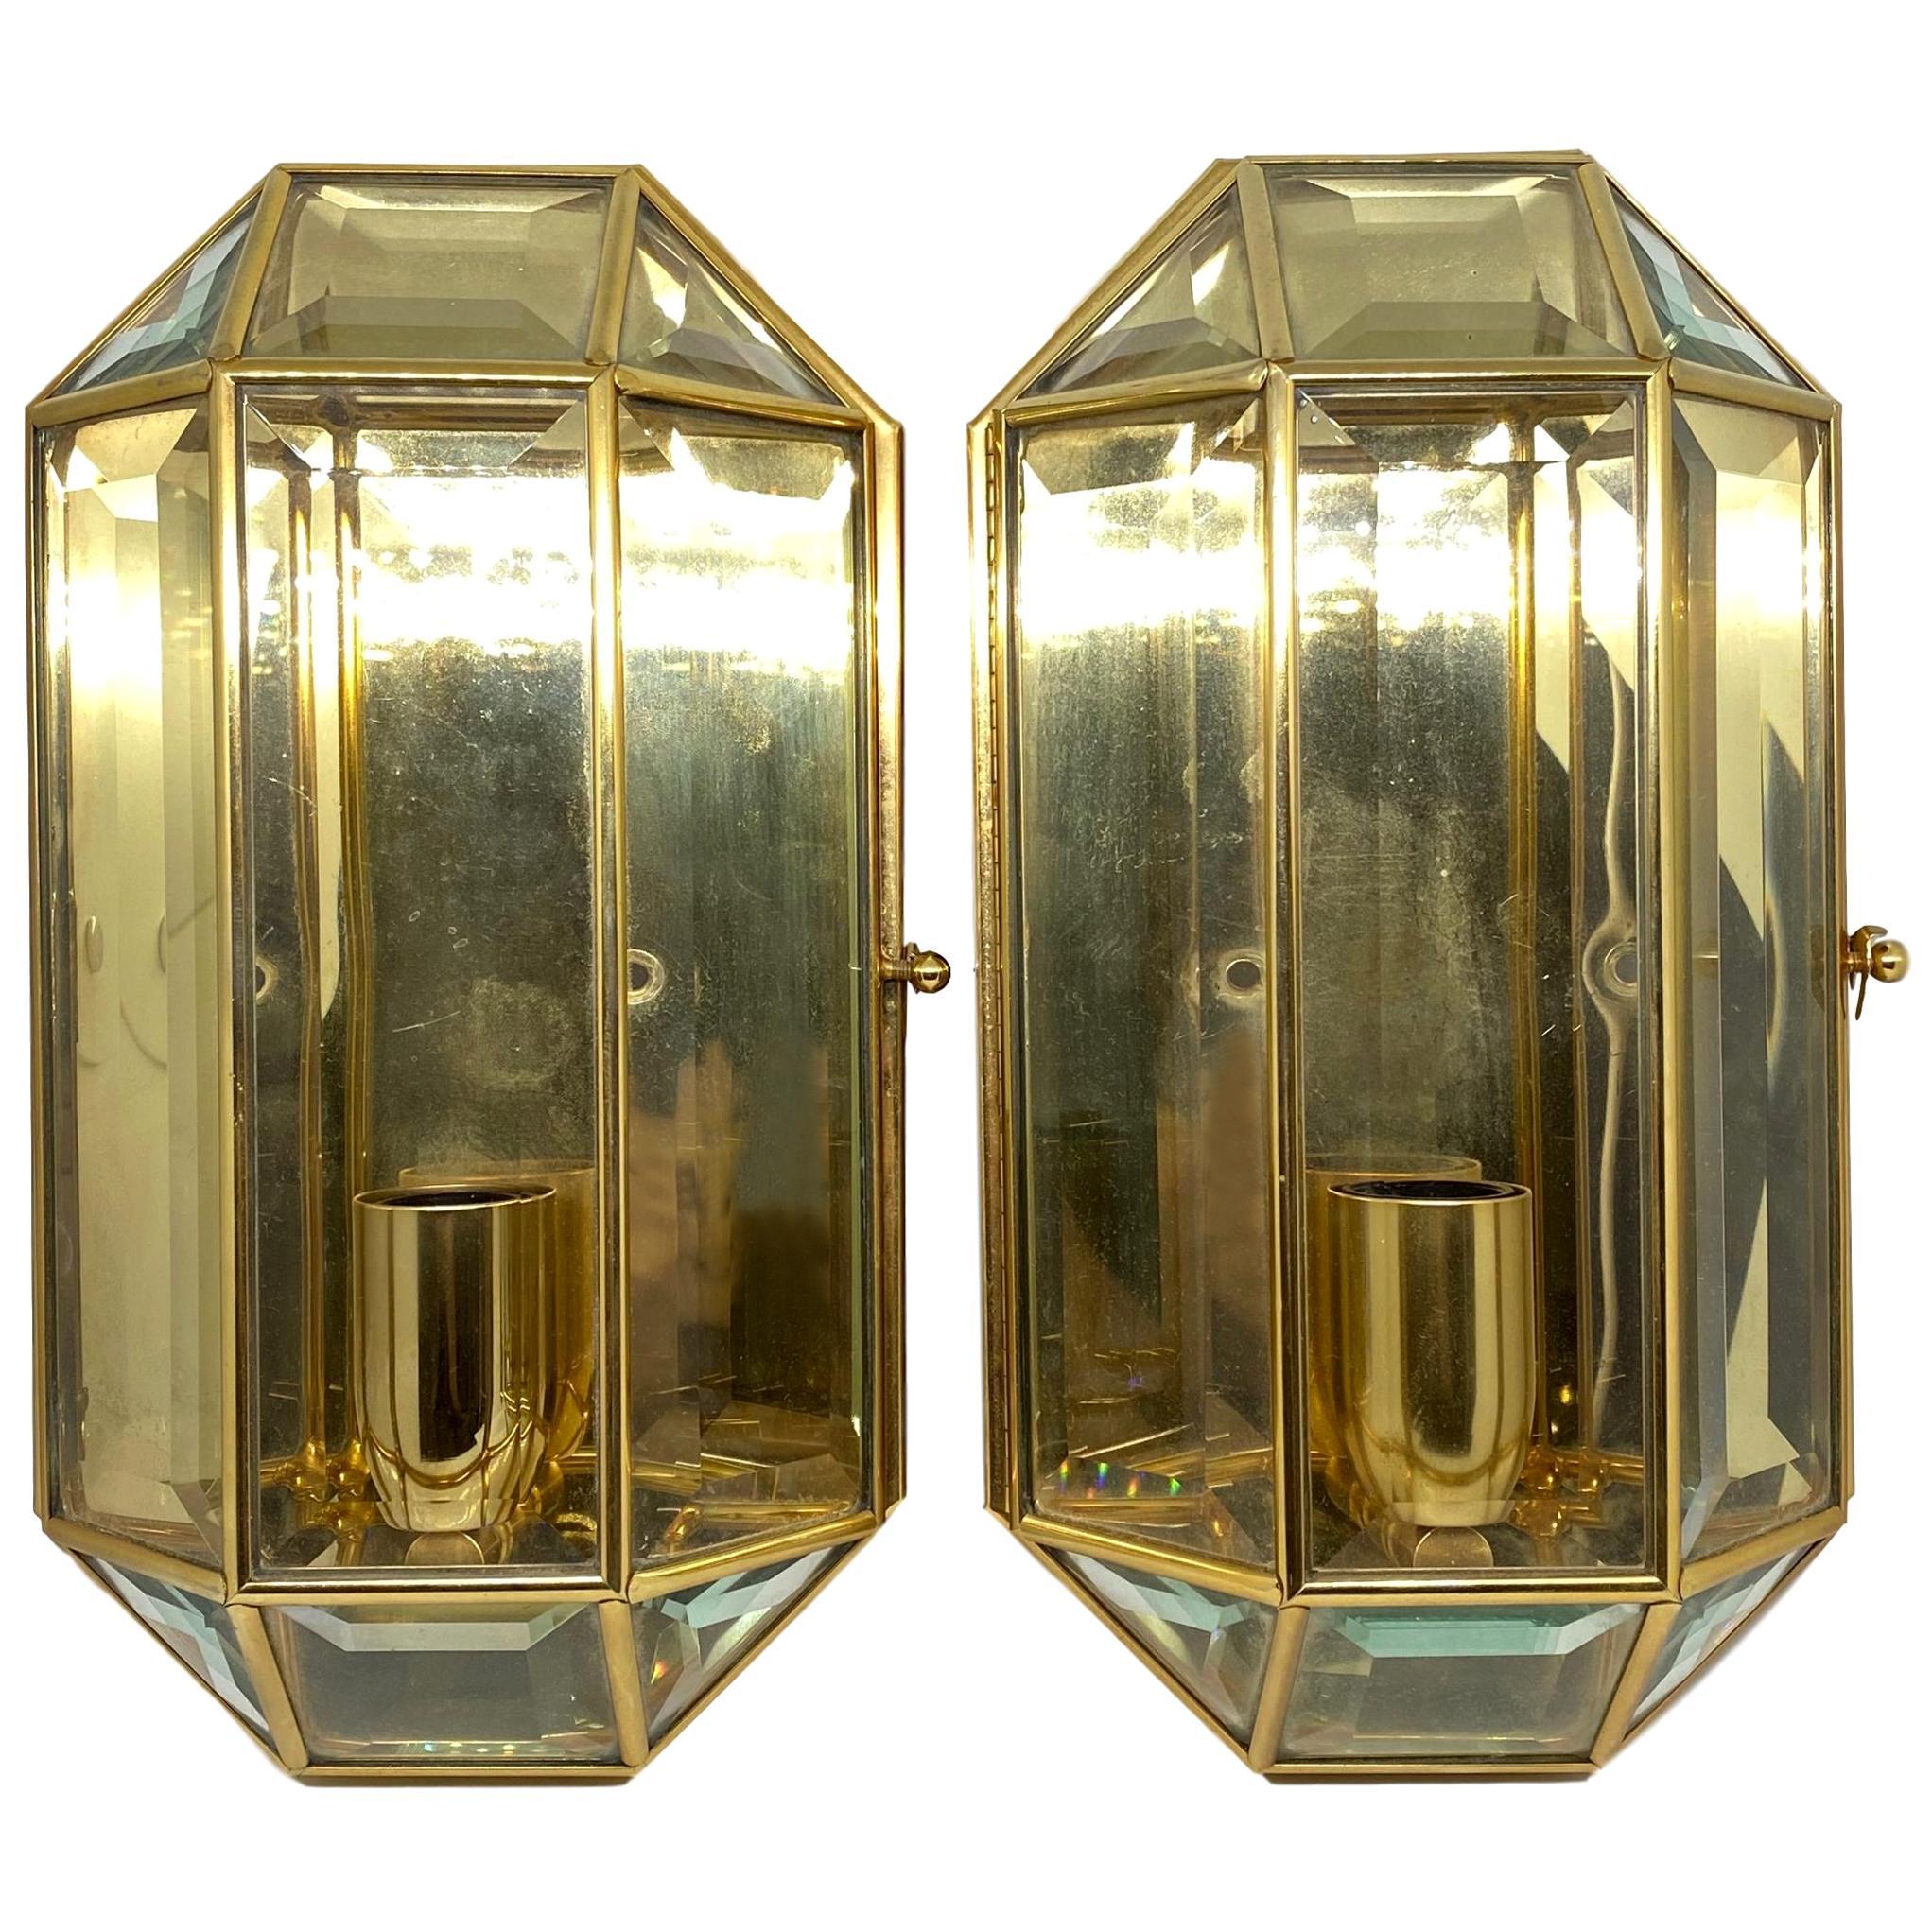 Pair of Modernist 1970s German Octagonal Brass and Glass Wall Lights